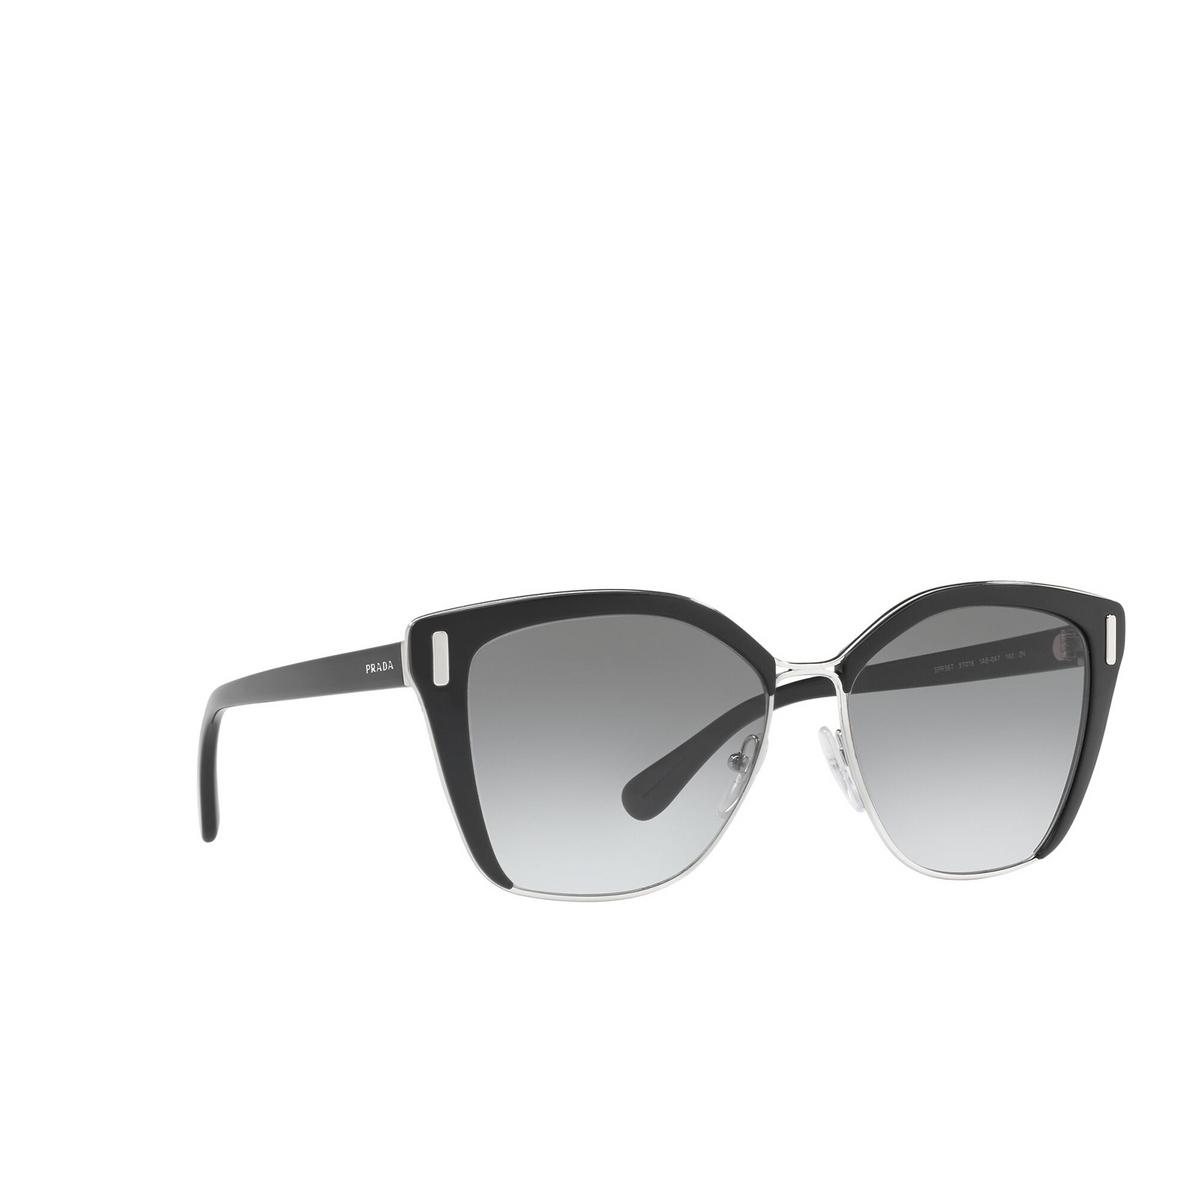 Prada® Square Sunglasses: PR 56TS color Black / Silver 1AB0A7.